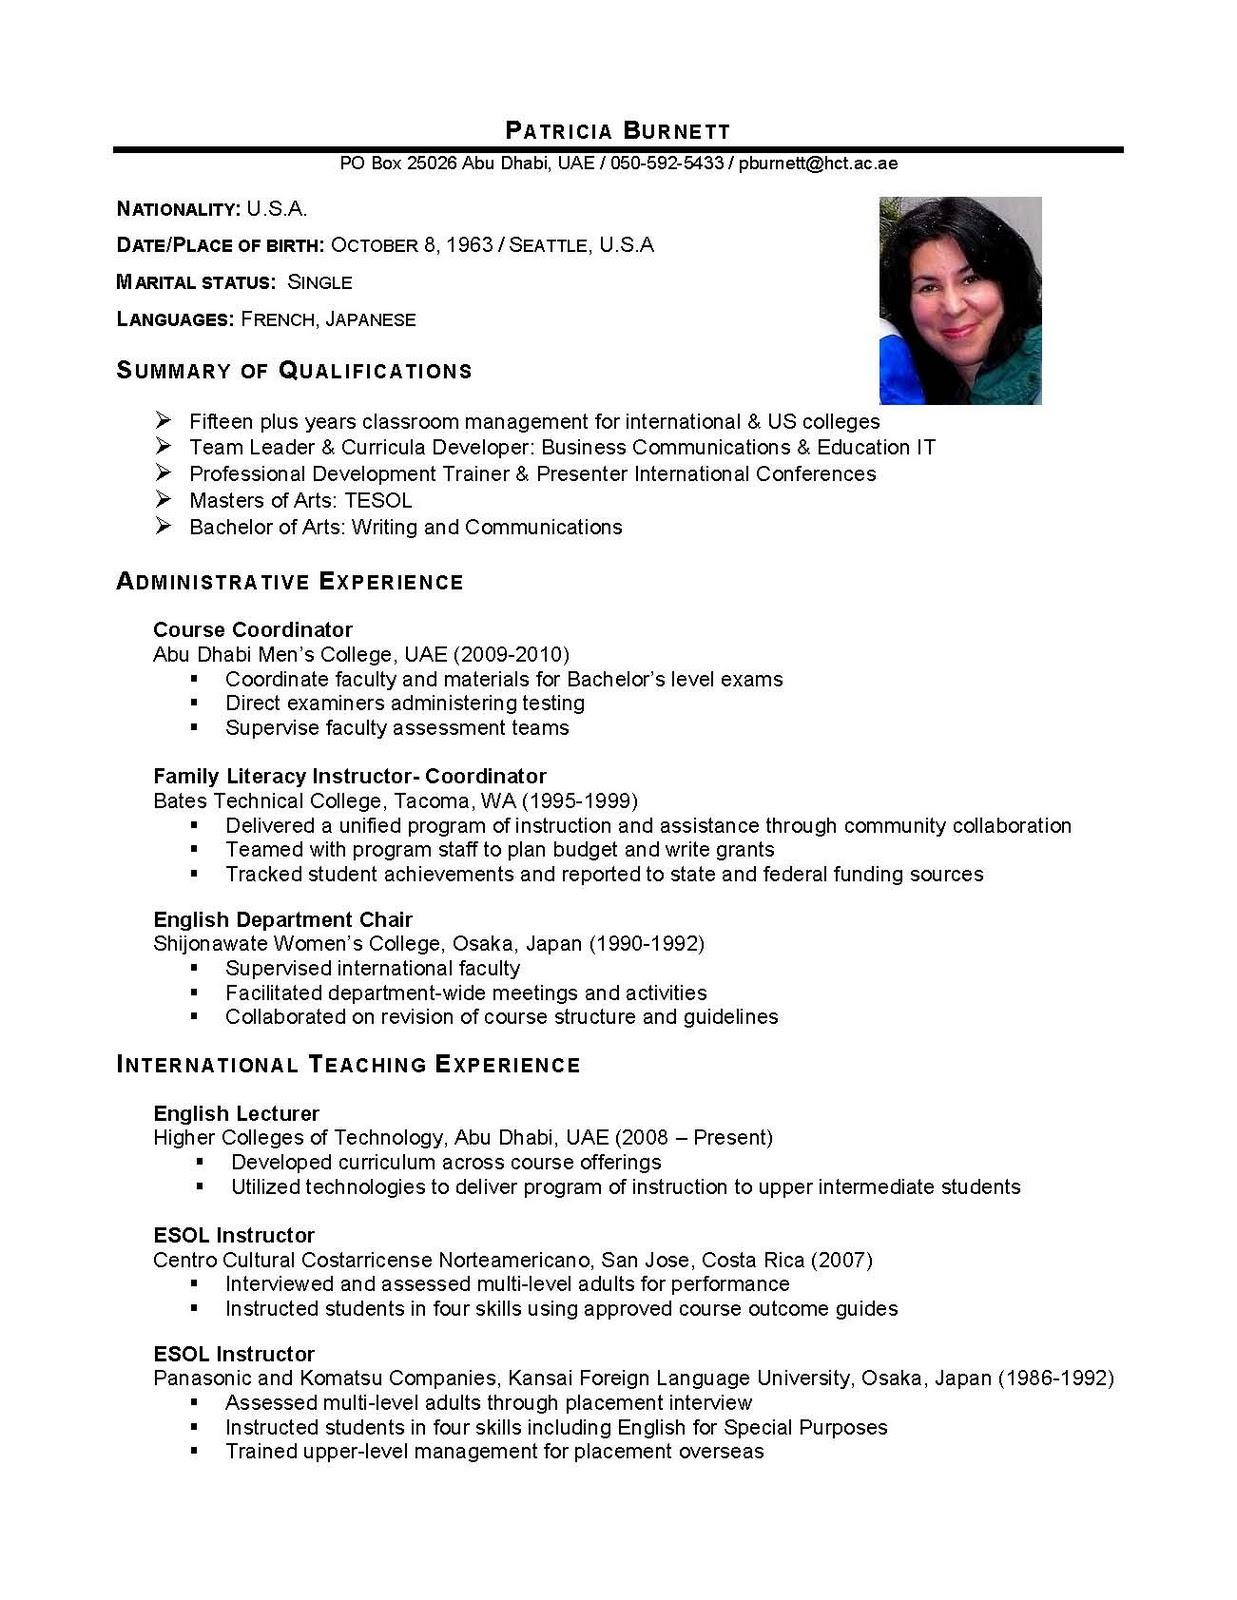 Business Resume Building Resume Writing Resume Examples Cover Letters Resume  Portfolio Personal Resume Branding